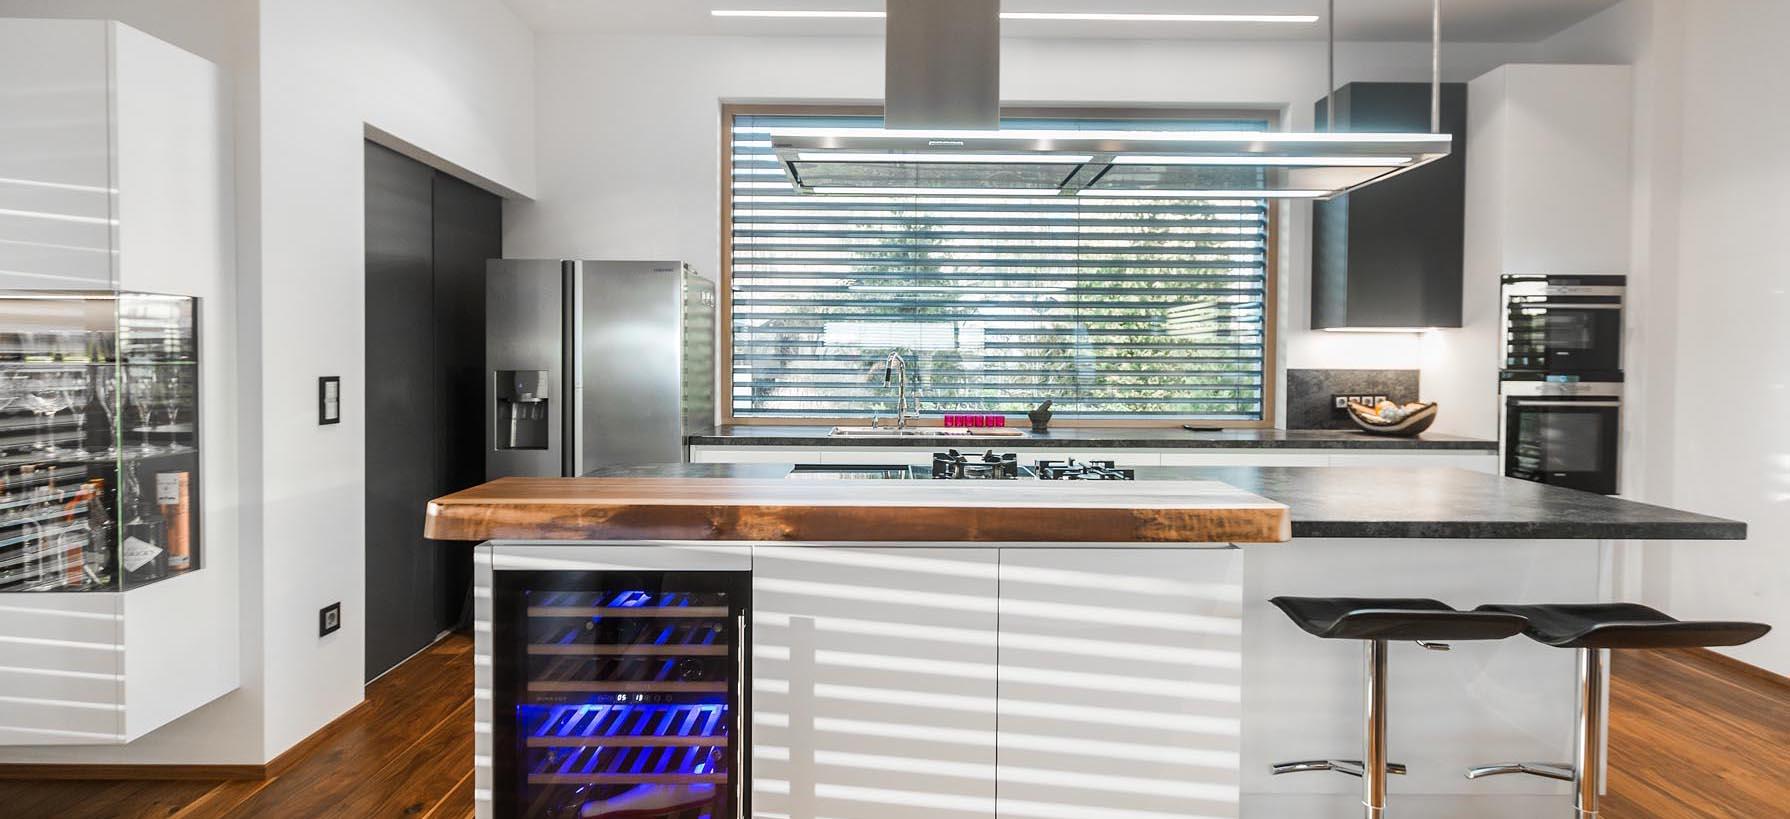 Uporabne površine v kuhinji